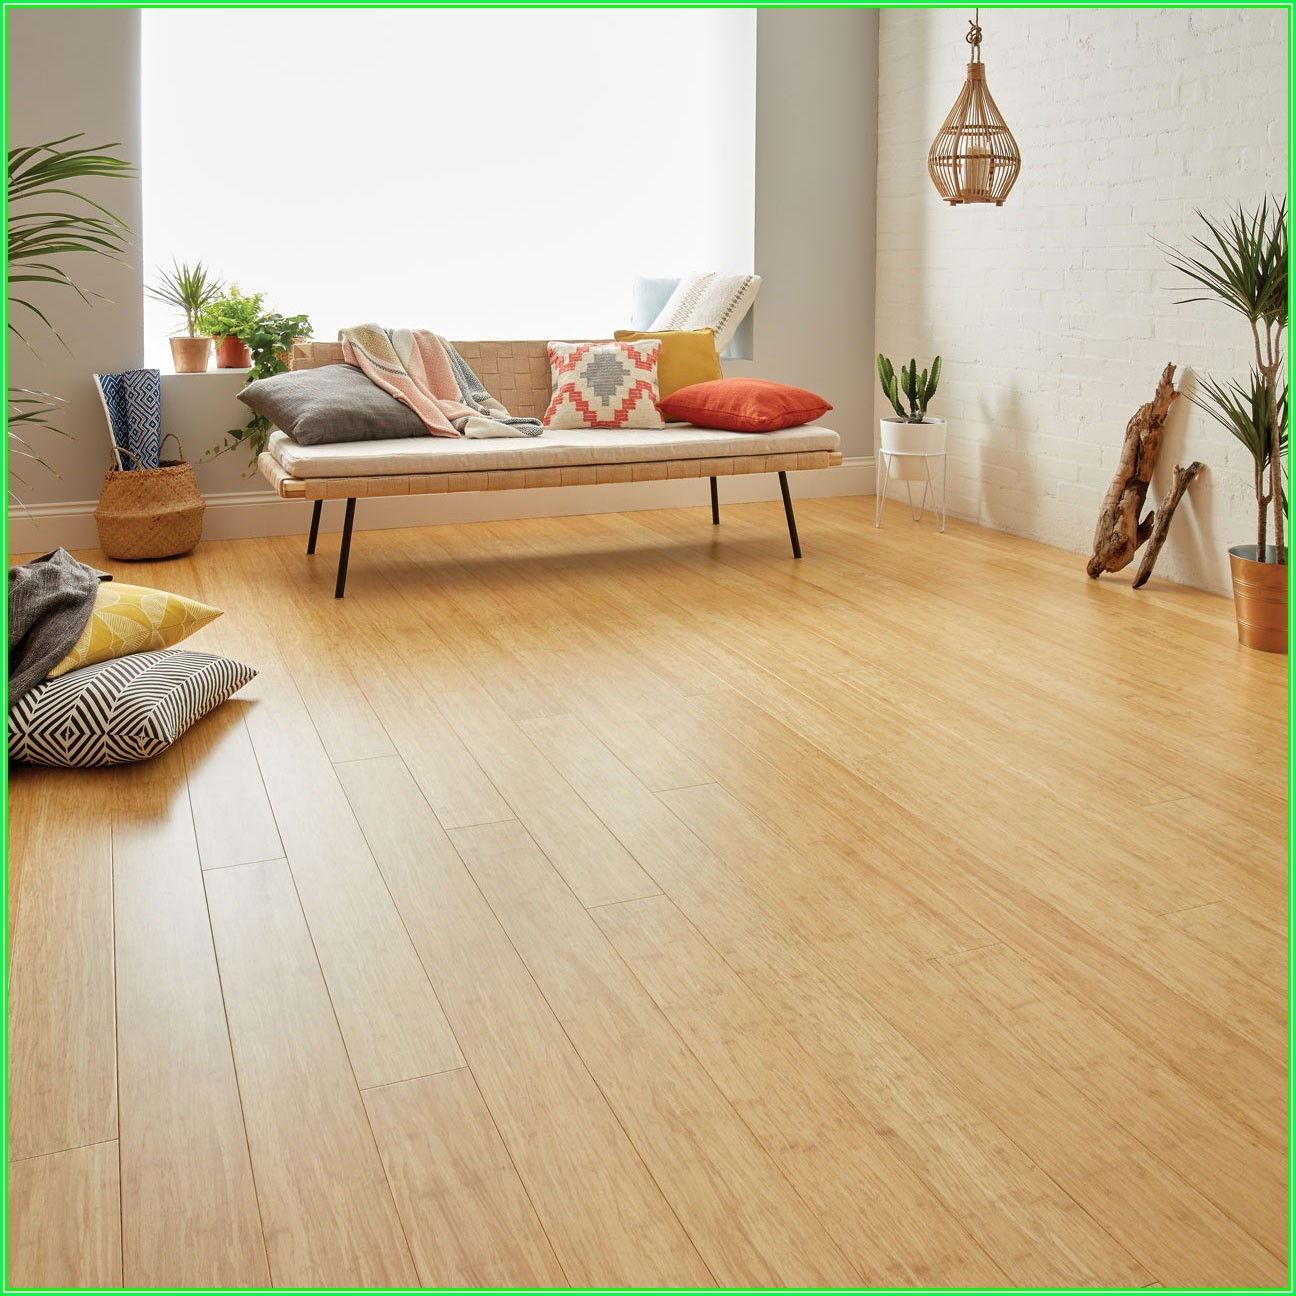 Is Bamboo Flooring Sustainable